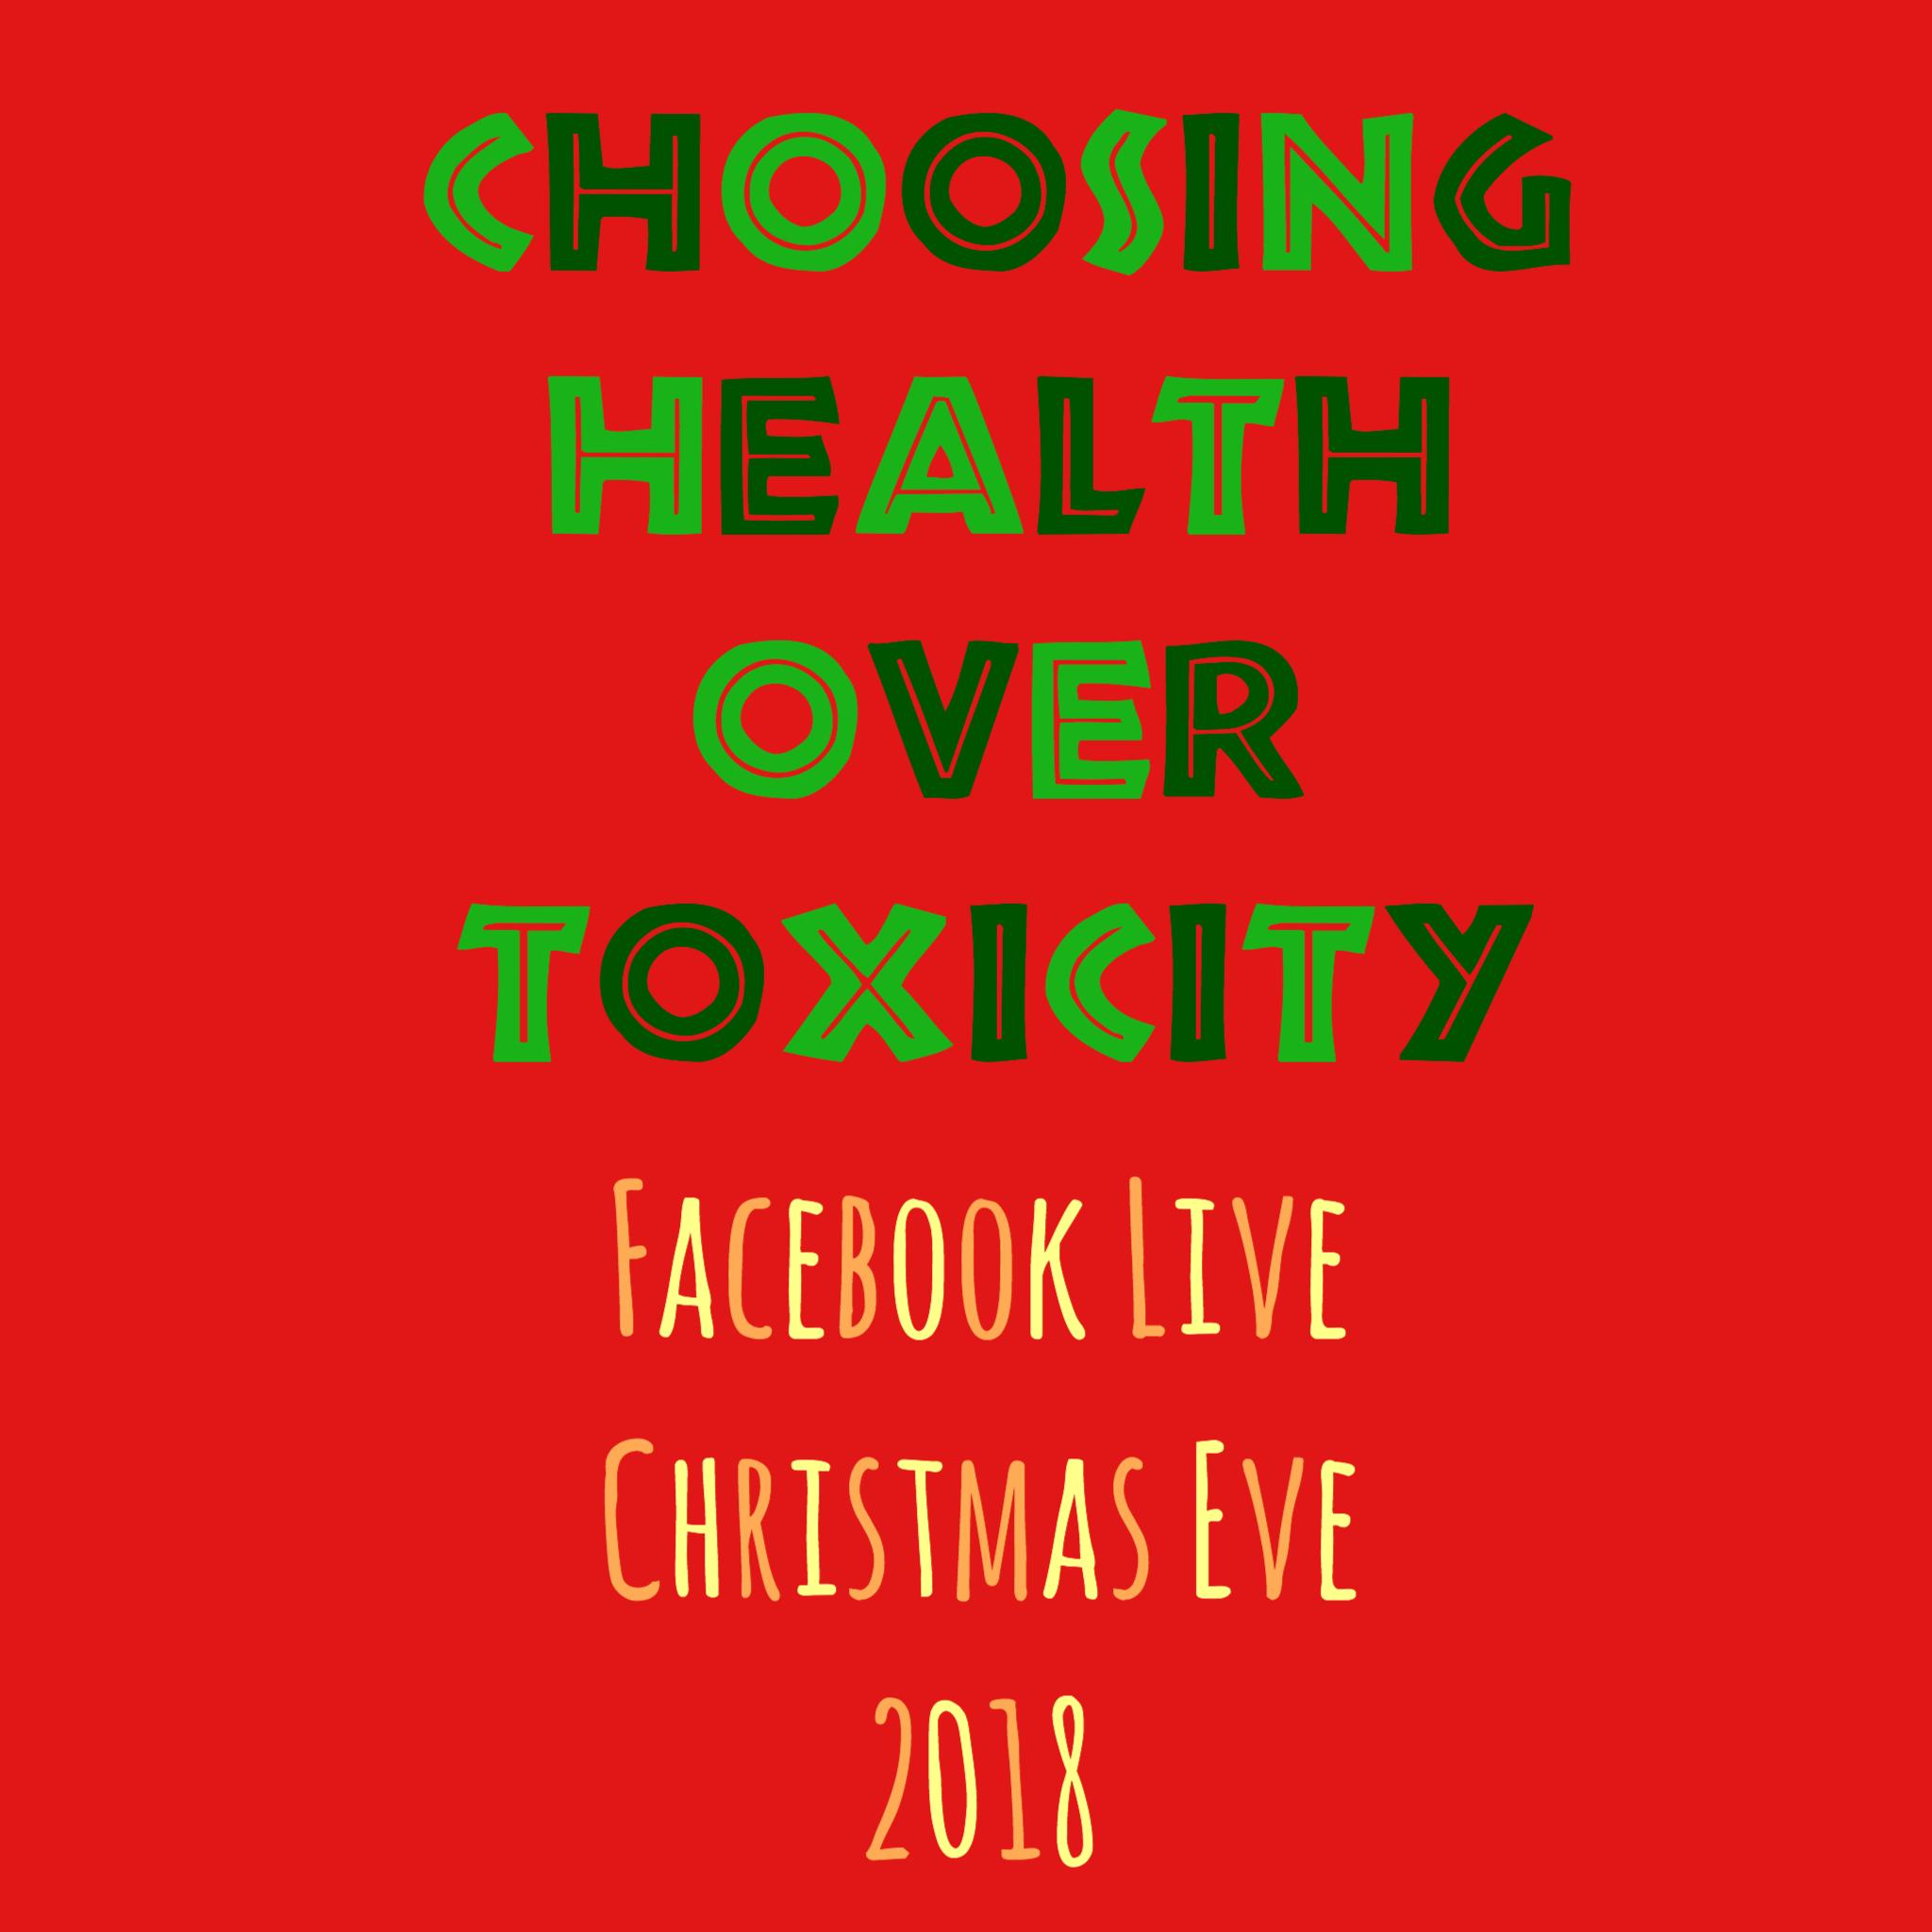 Christmas Eve Facebook Live.JPG